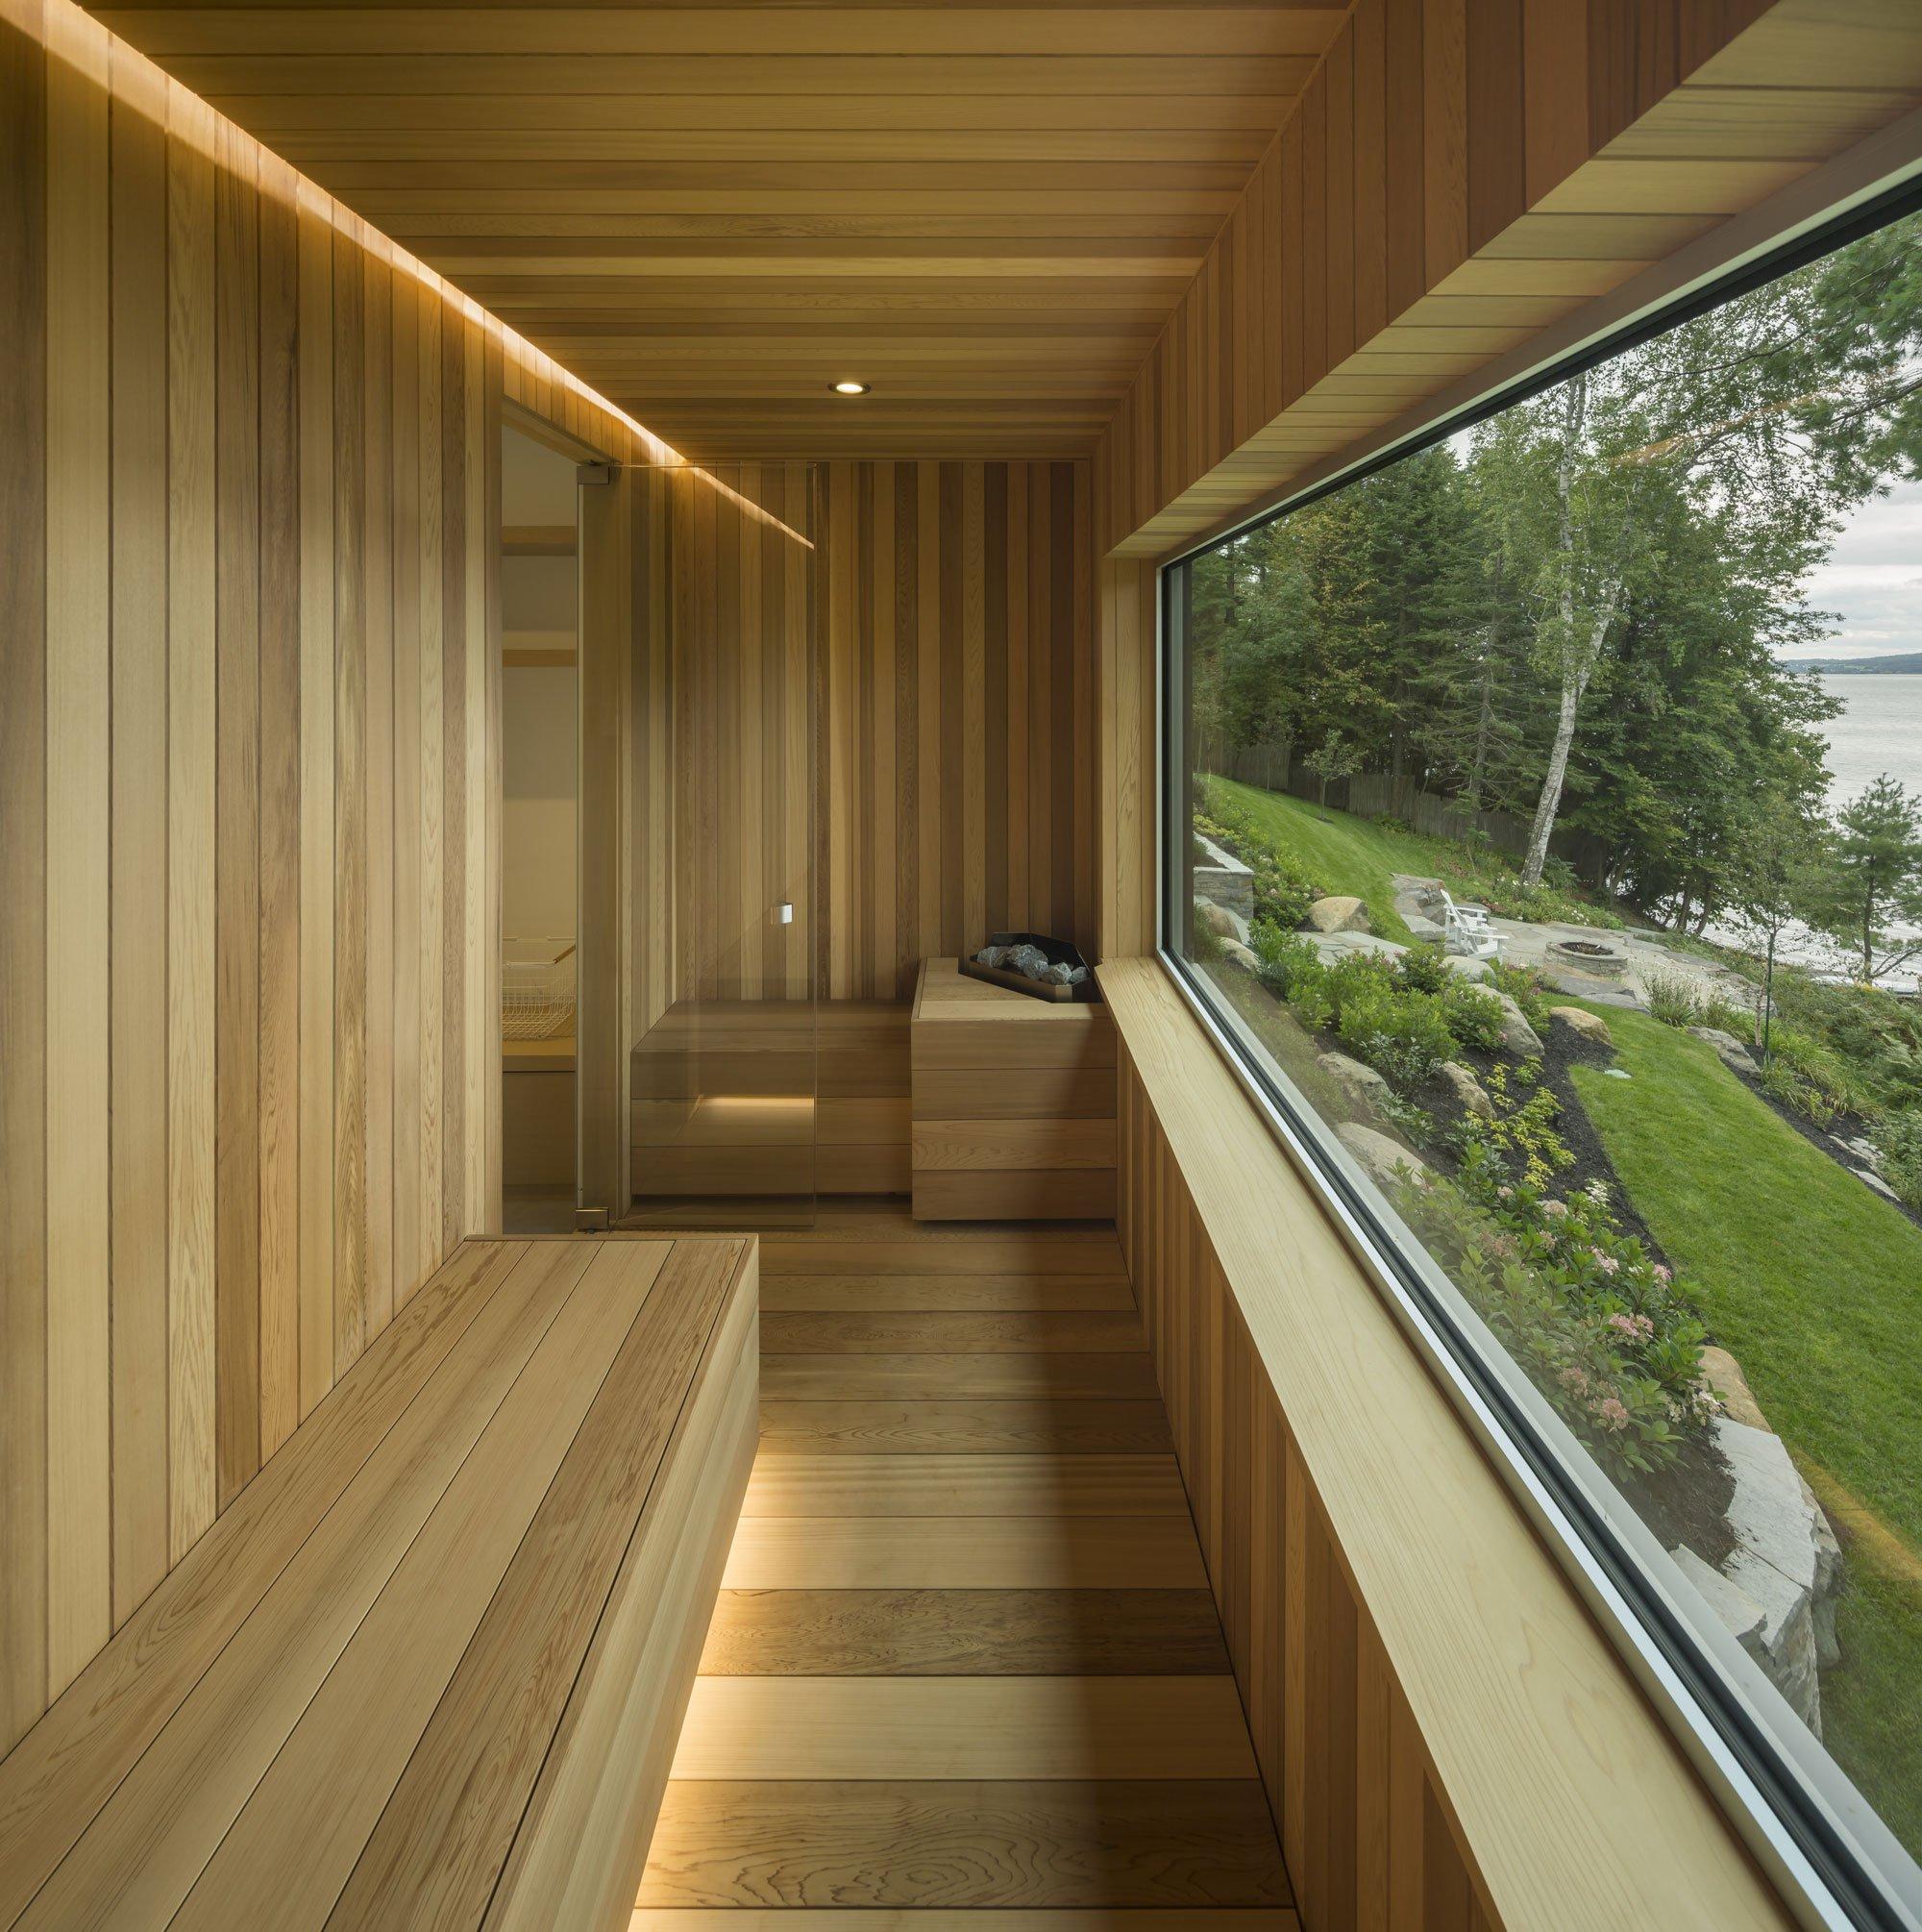 Modern Lake House Architecture: The Slender House